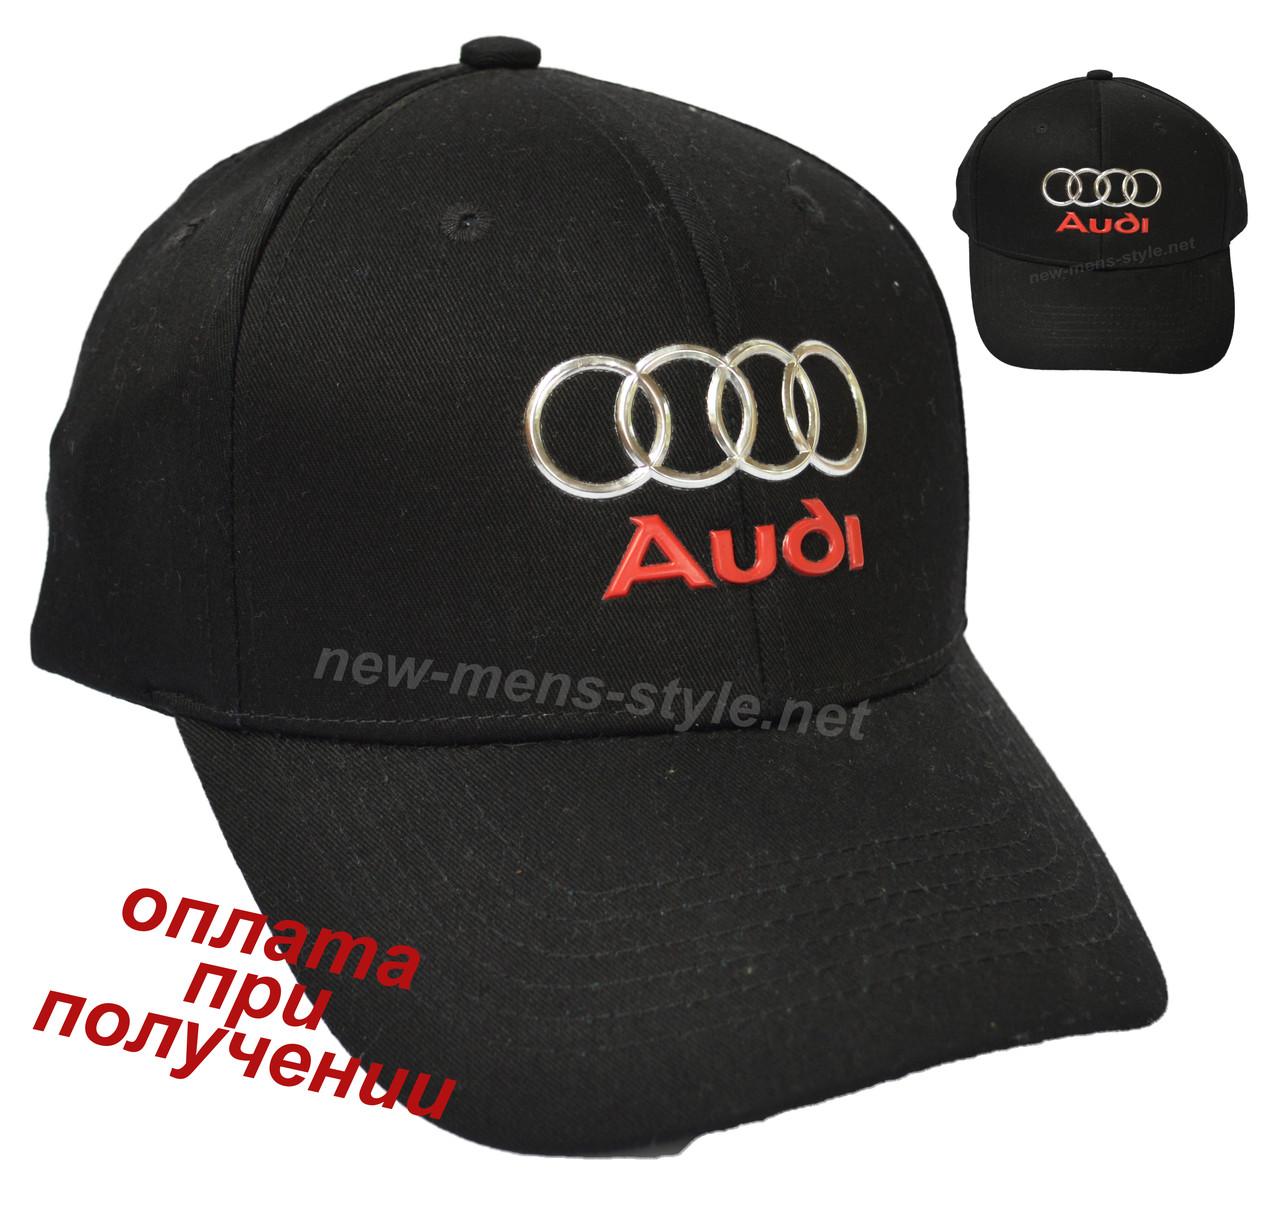 Мужская чоловіча спортивная кепка бейсболка блайзер Ауди Audi